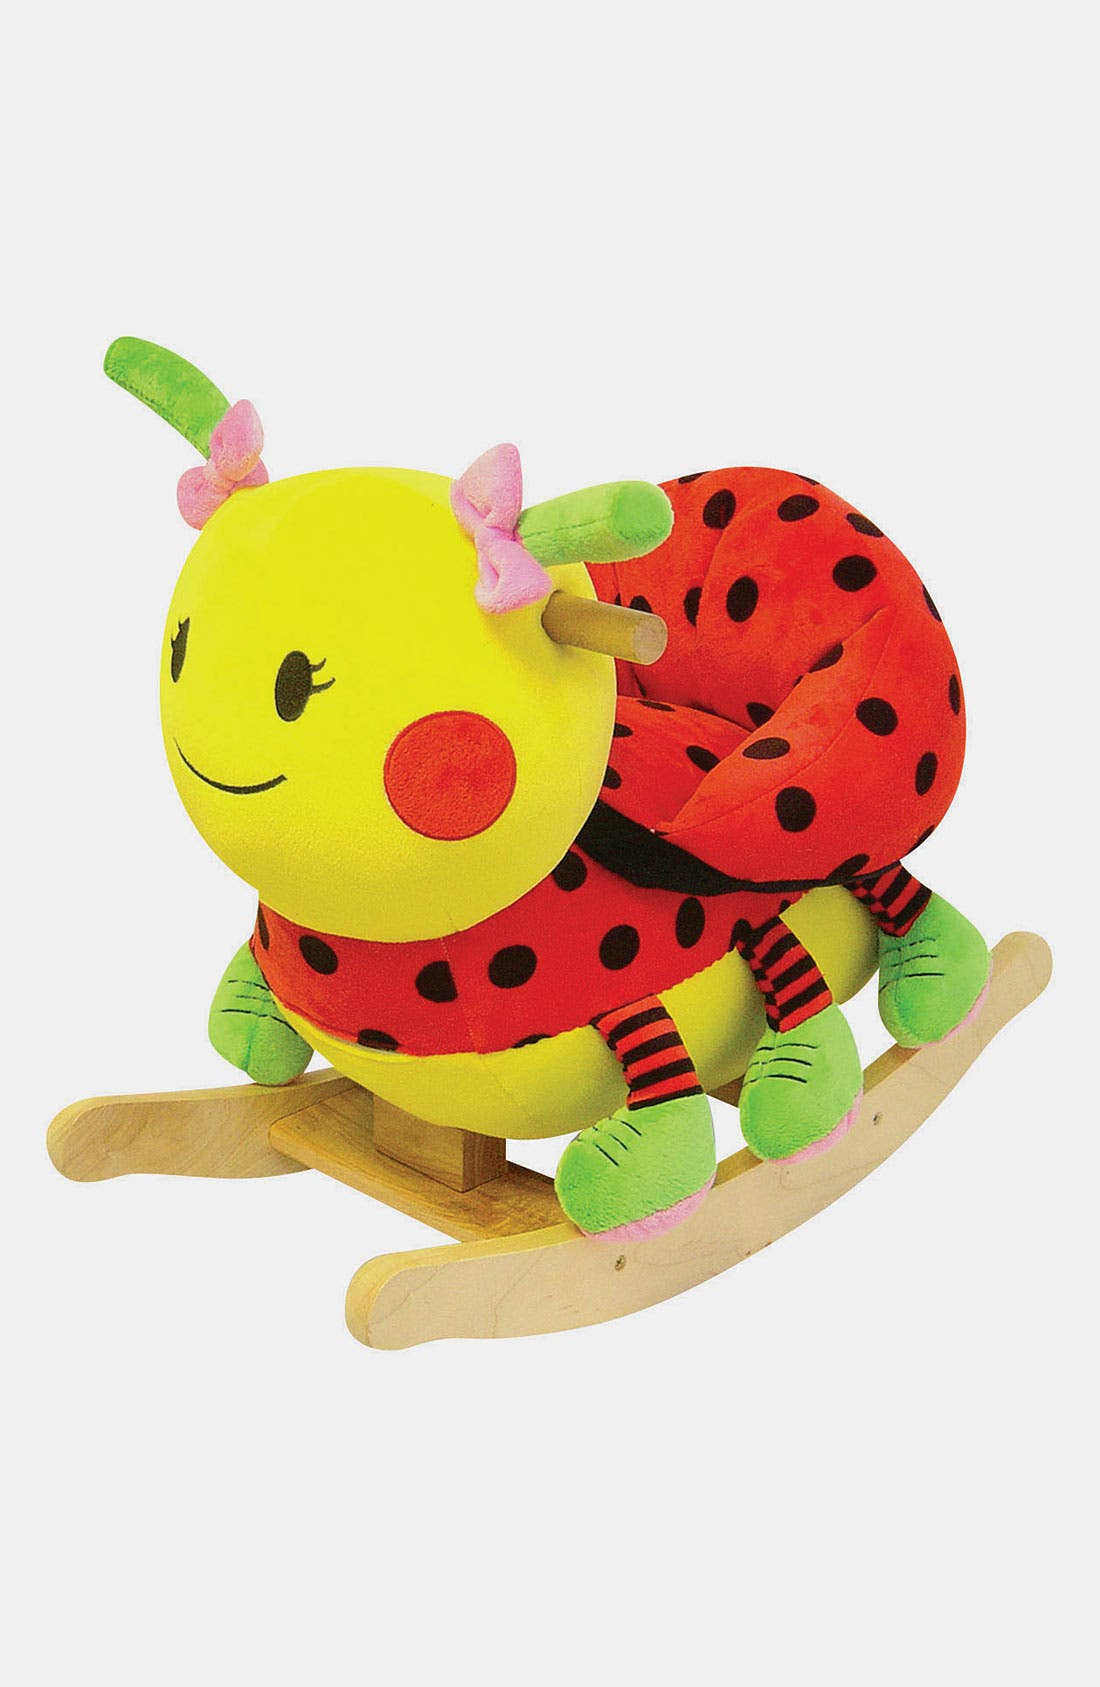 Alternate Image 1 Selected - Charm Co. 'Ladybug' Musical Rocker